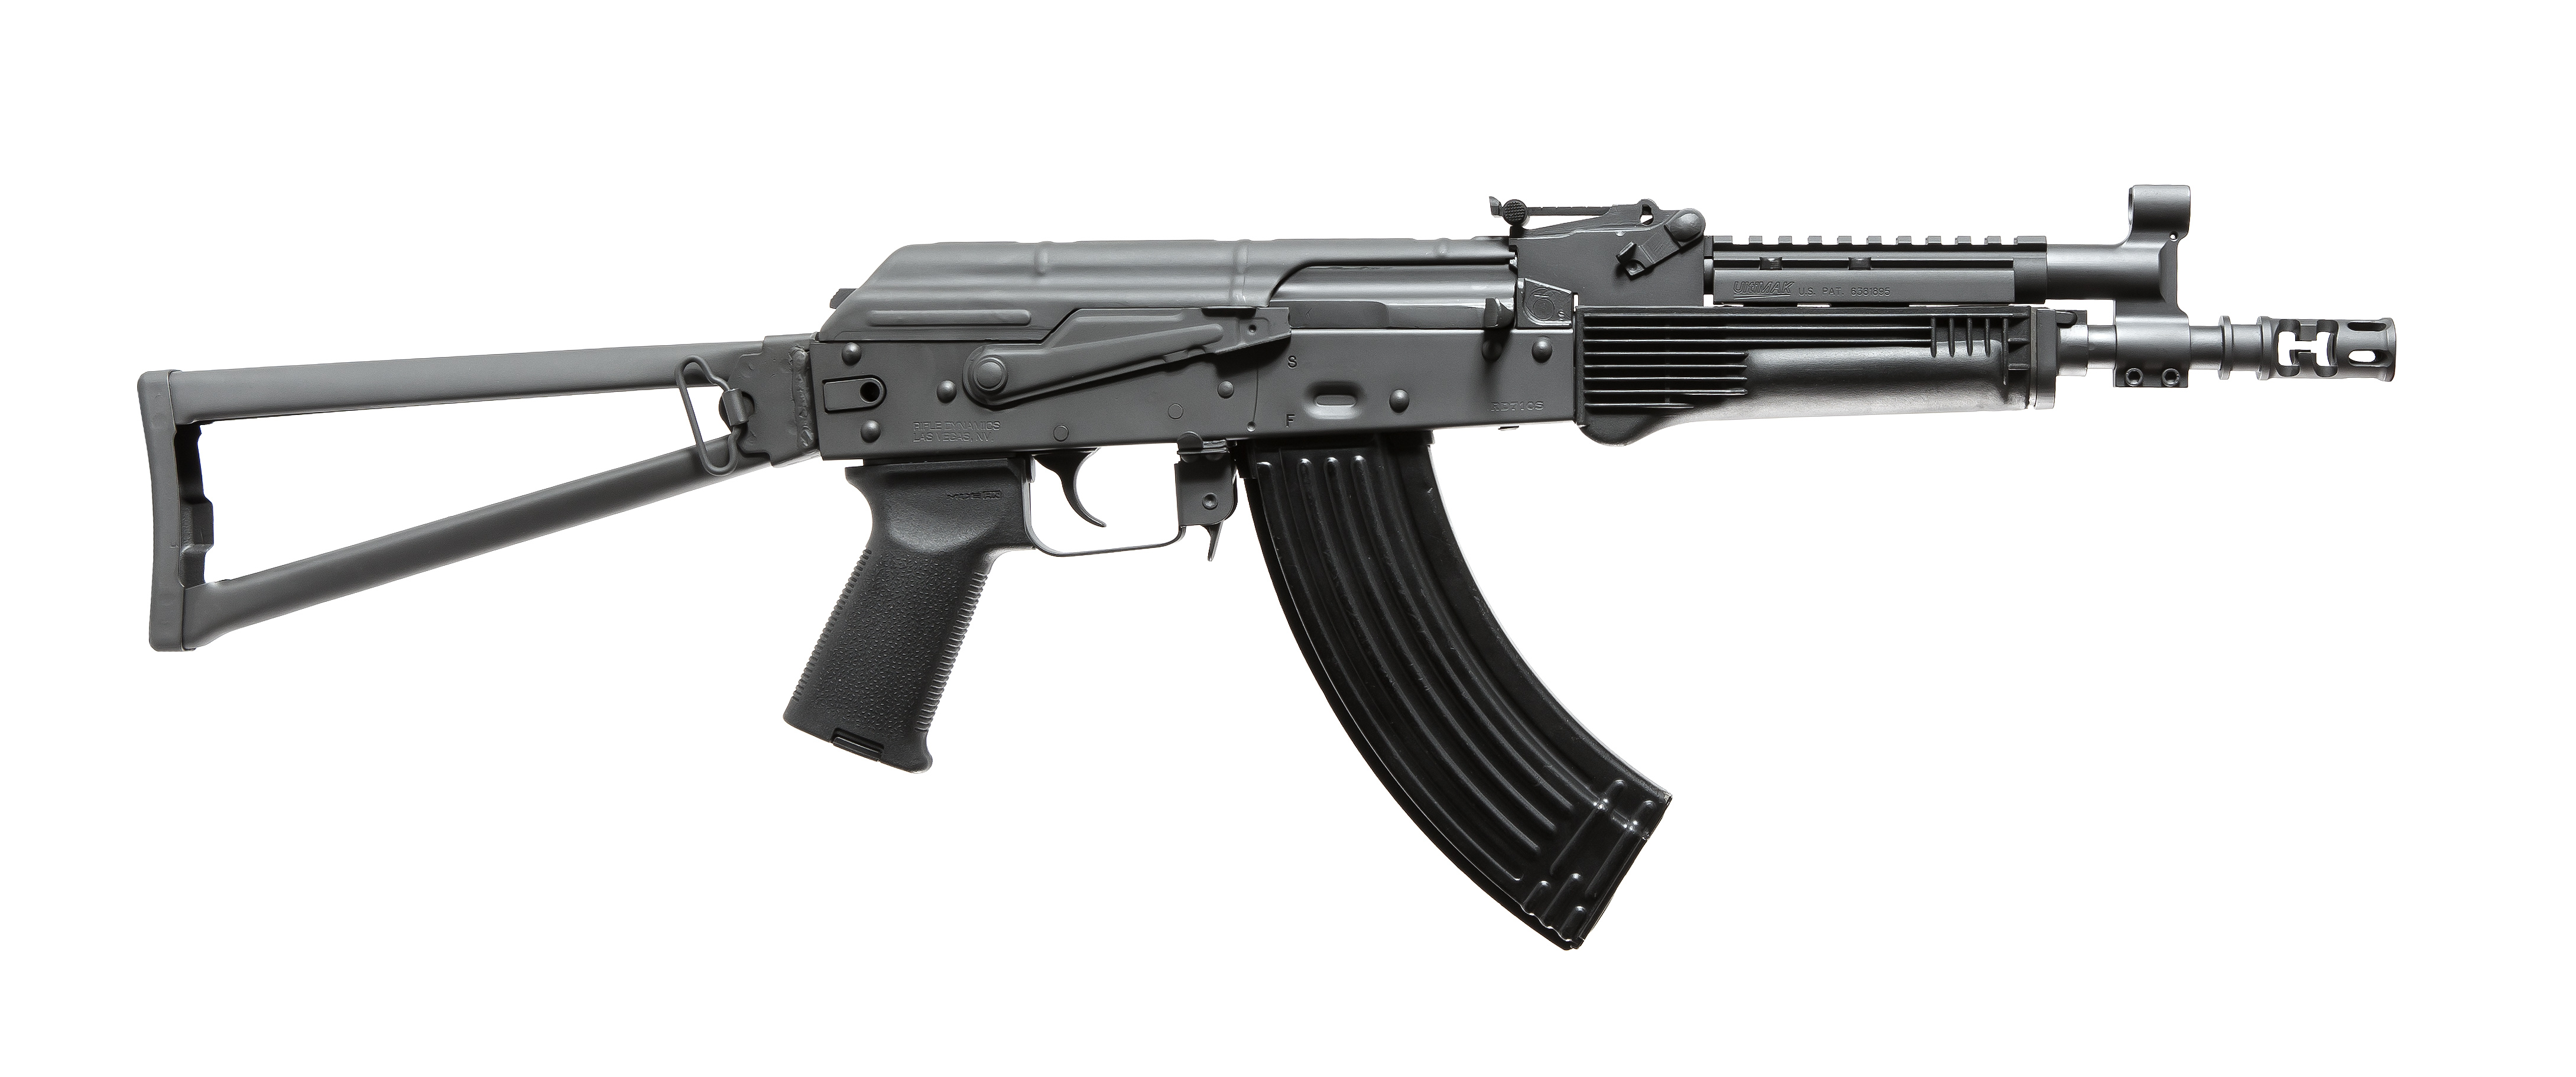 rifledynamicssite | NFA RIFLES